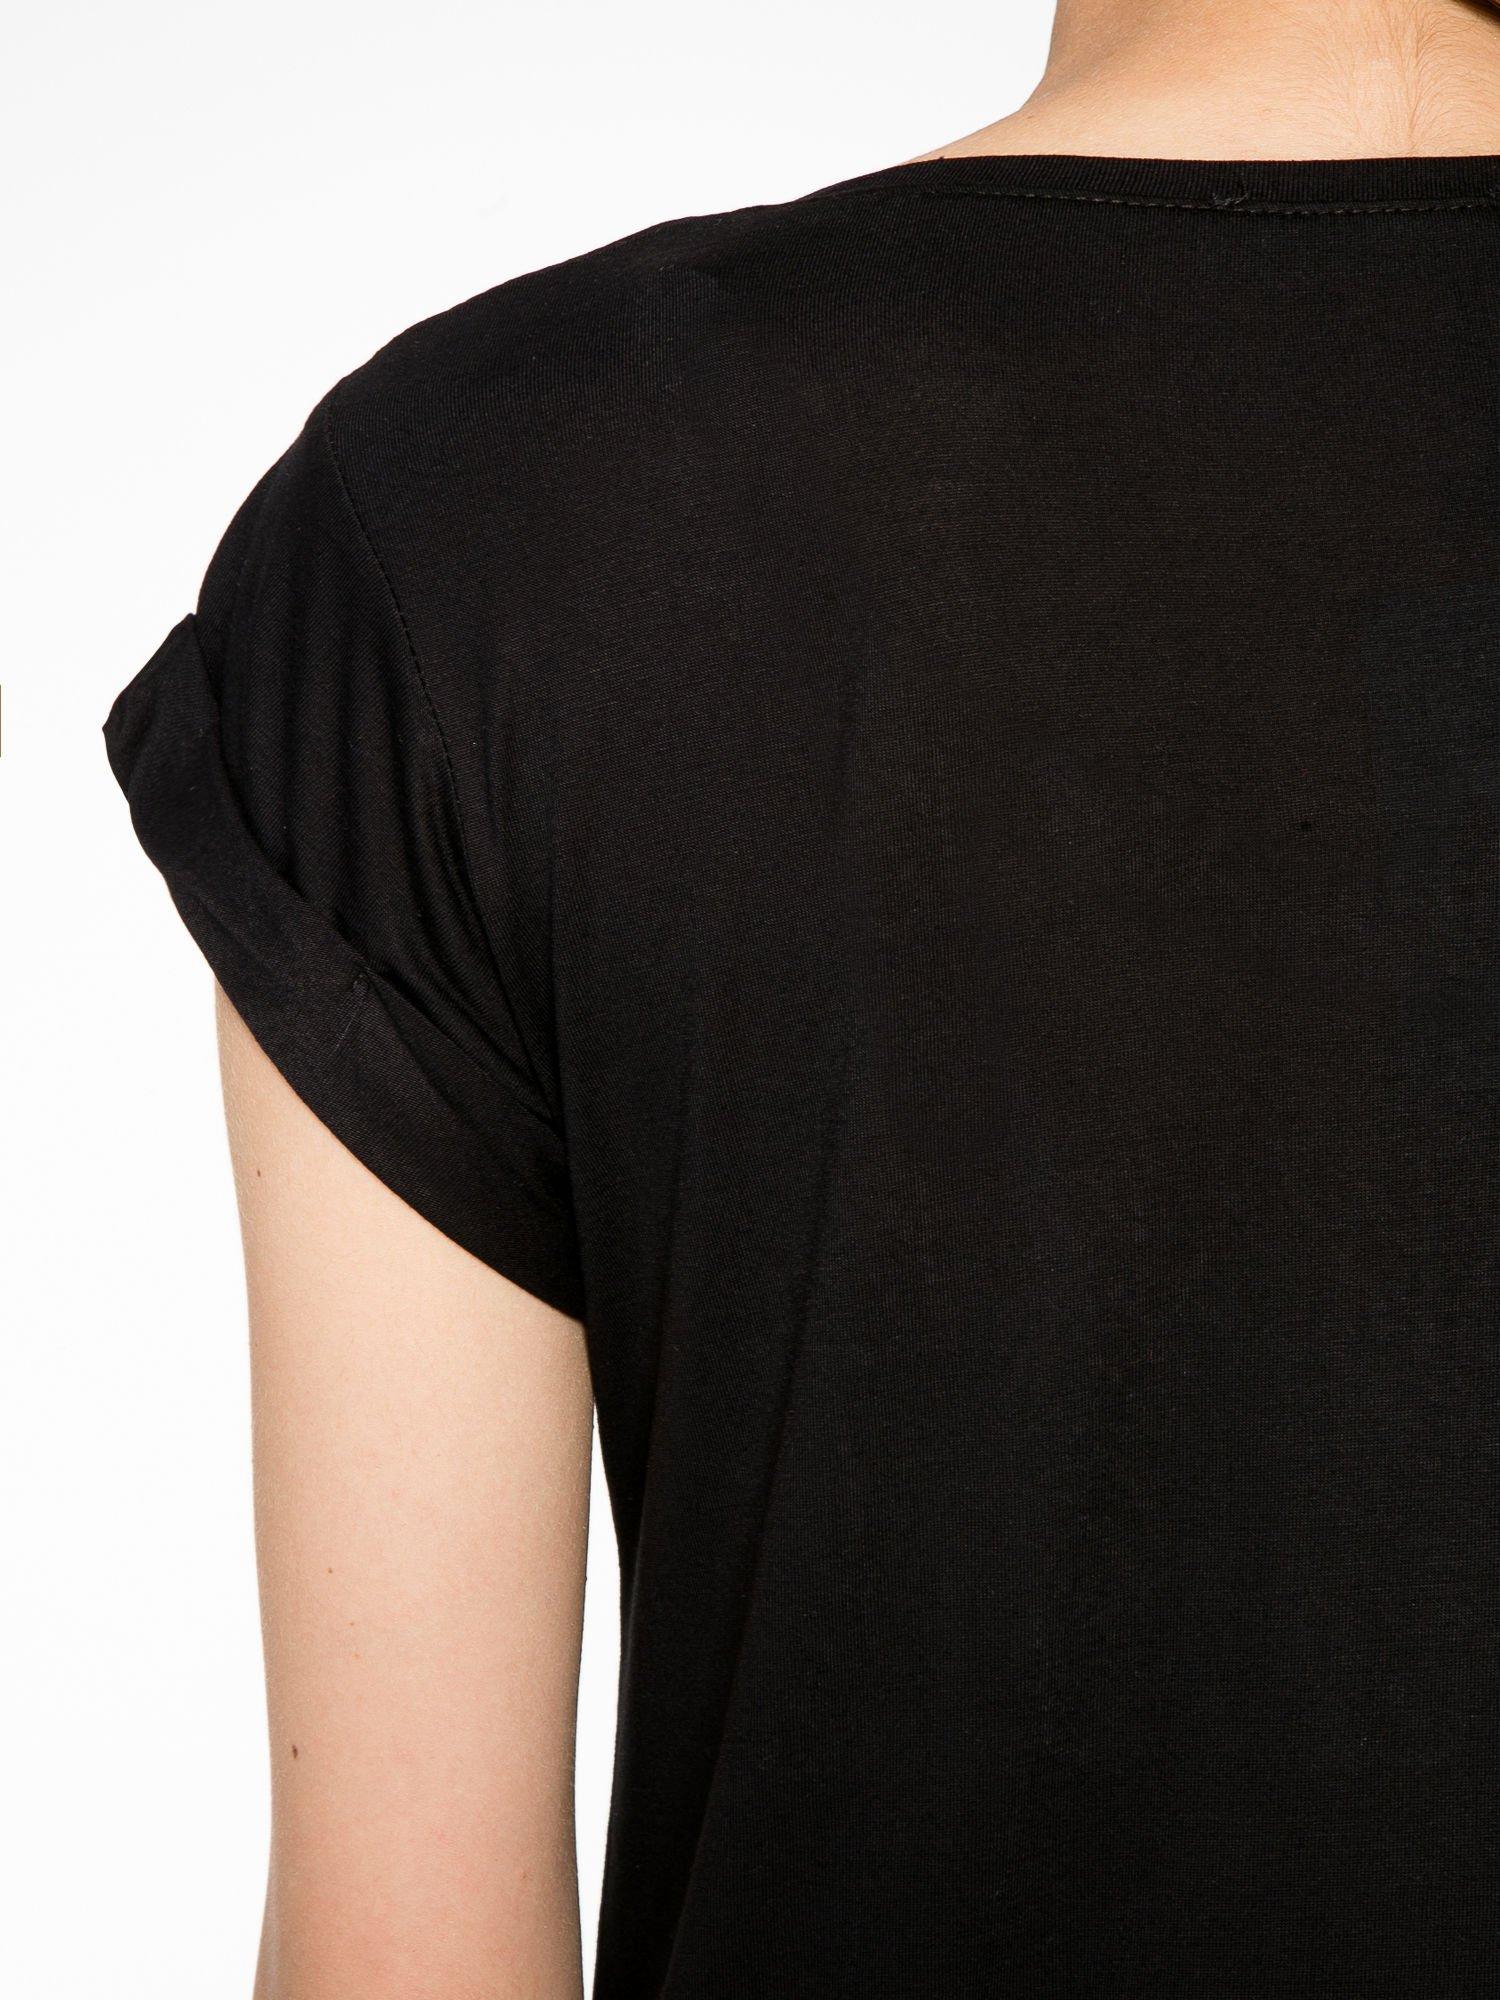 Czarny t-shirt z napisem DON'T WAIT                                  zdj.                                  10